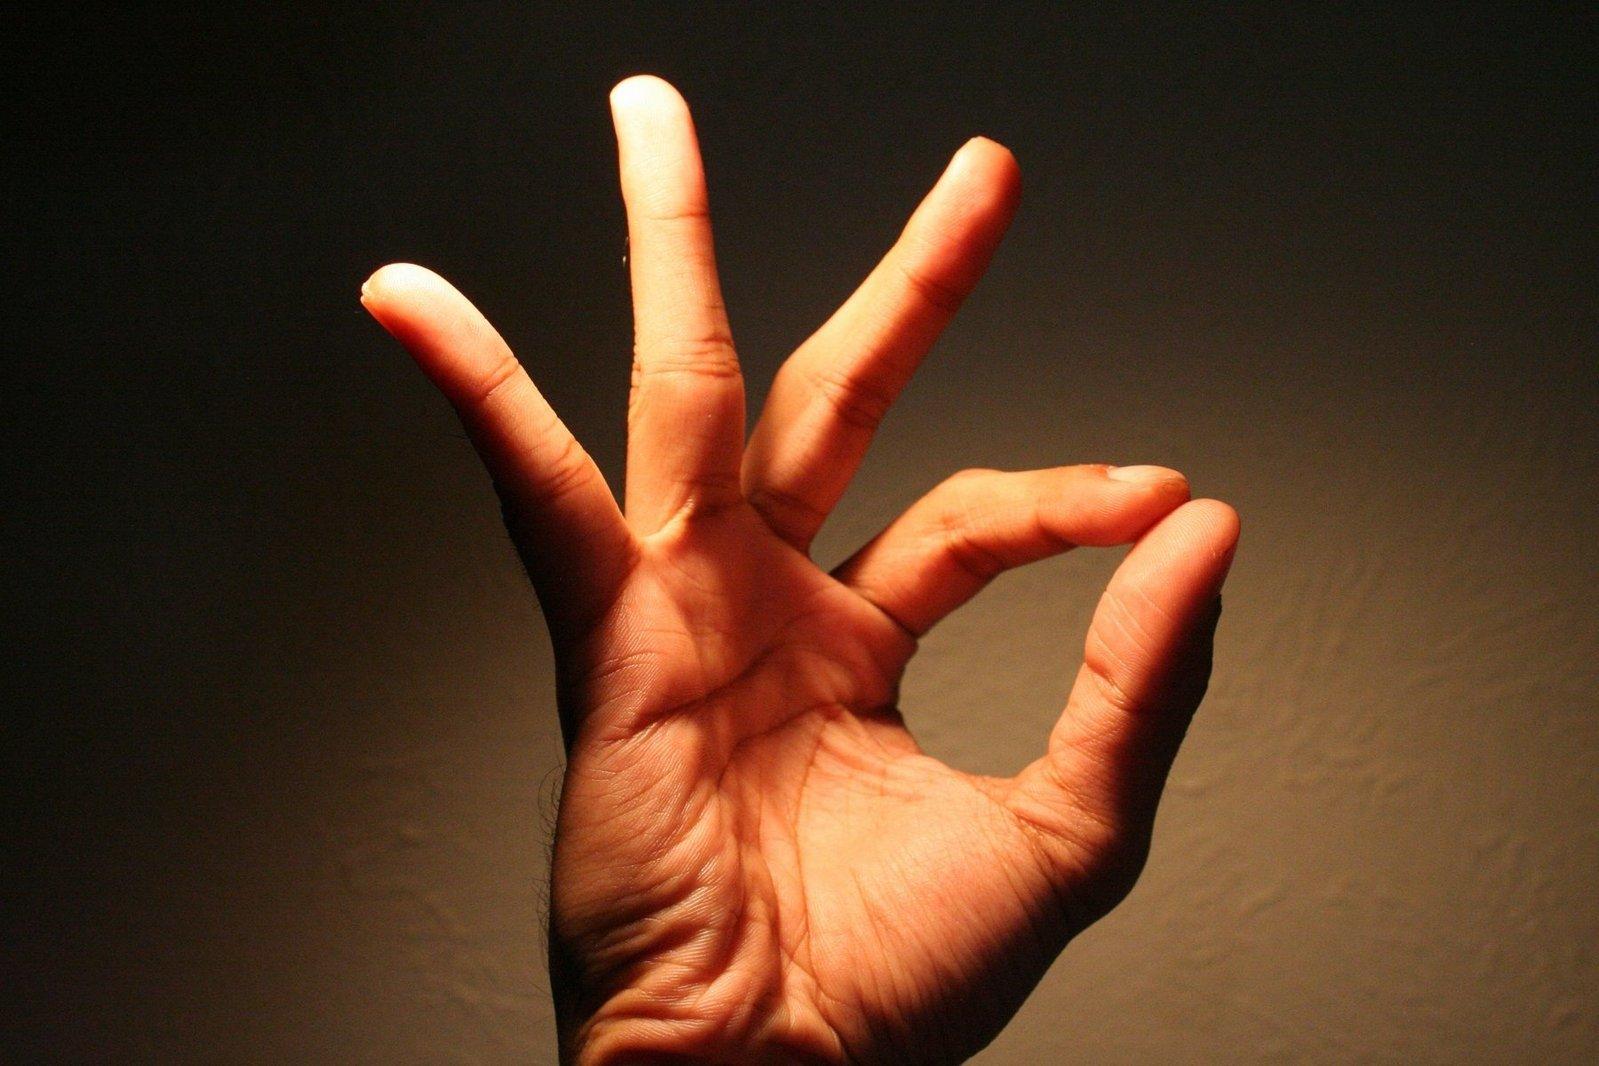 Some hand gestures